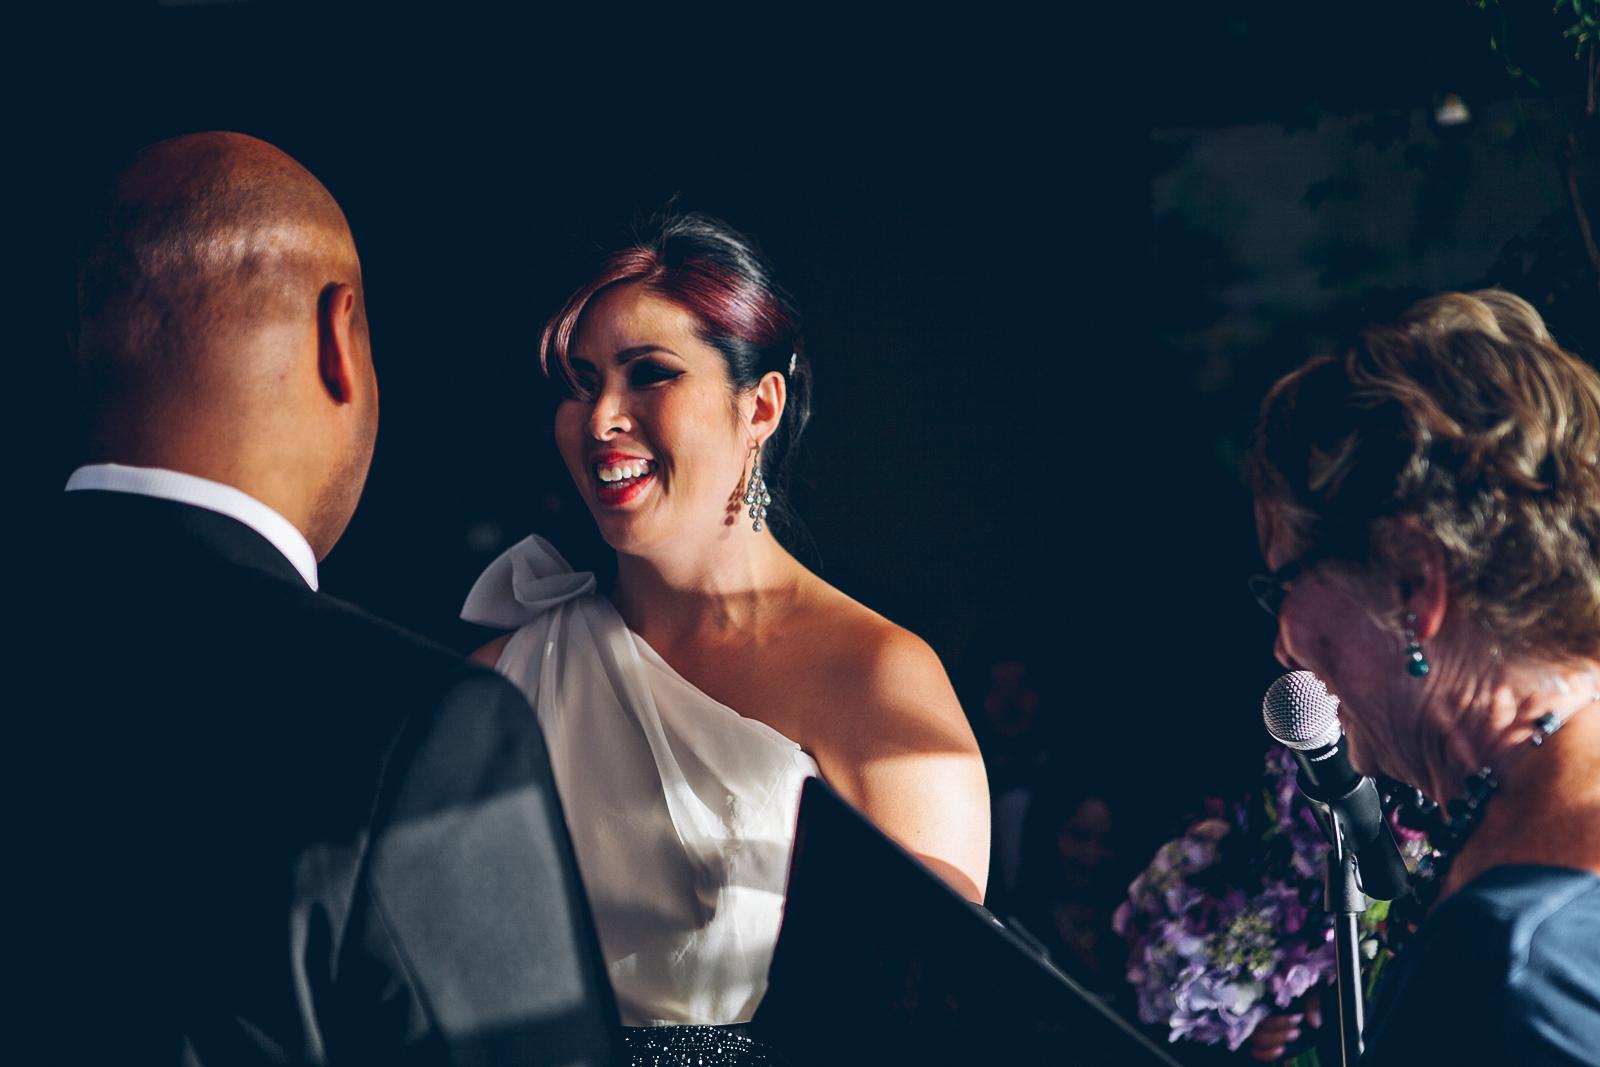 greens_restaurant_wedding_photography_san_franscisco_ebony_siovhan_bokeh_photography_40.jpg